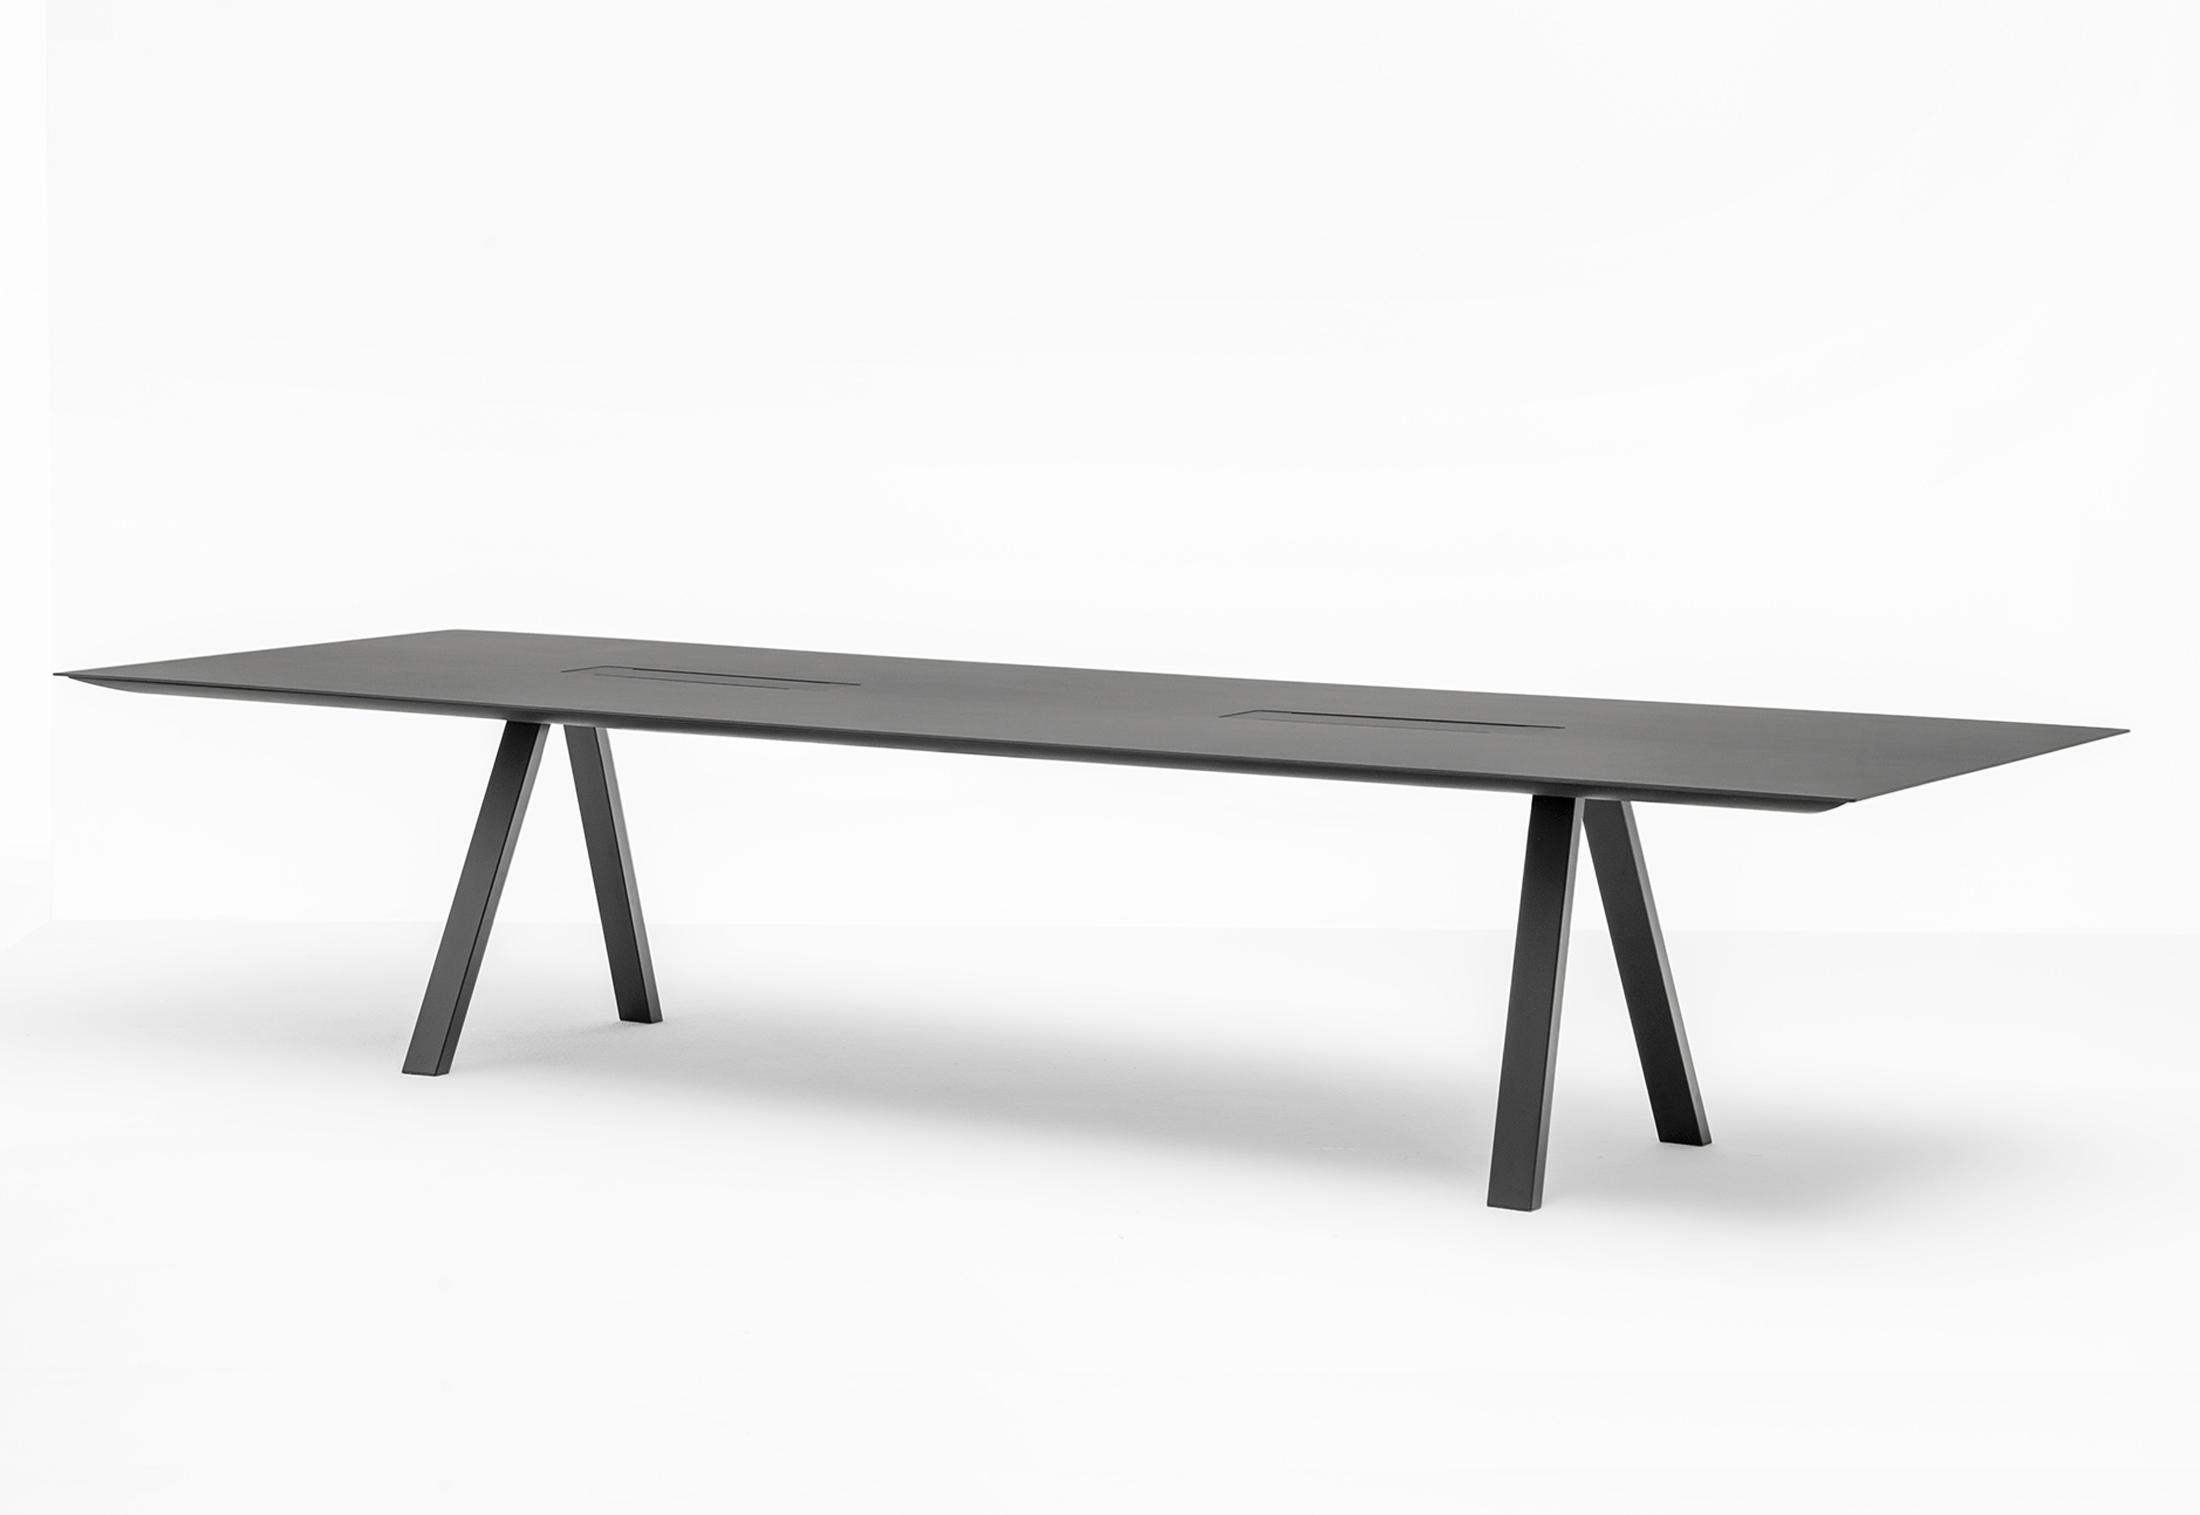 arki table ark von pedrali stylepark. Black Bedroom Furniture Sets. Home Design Ideas